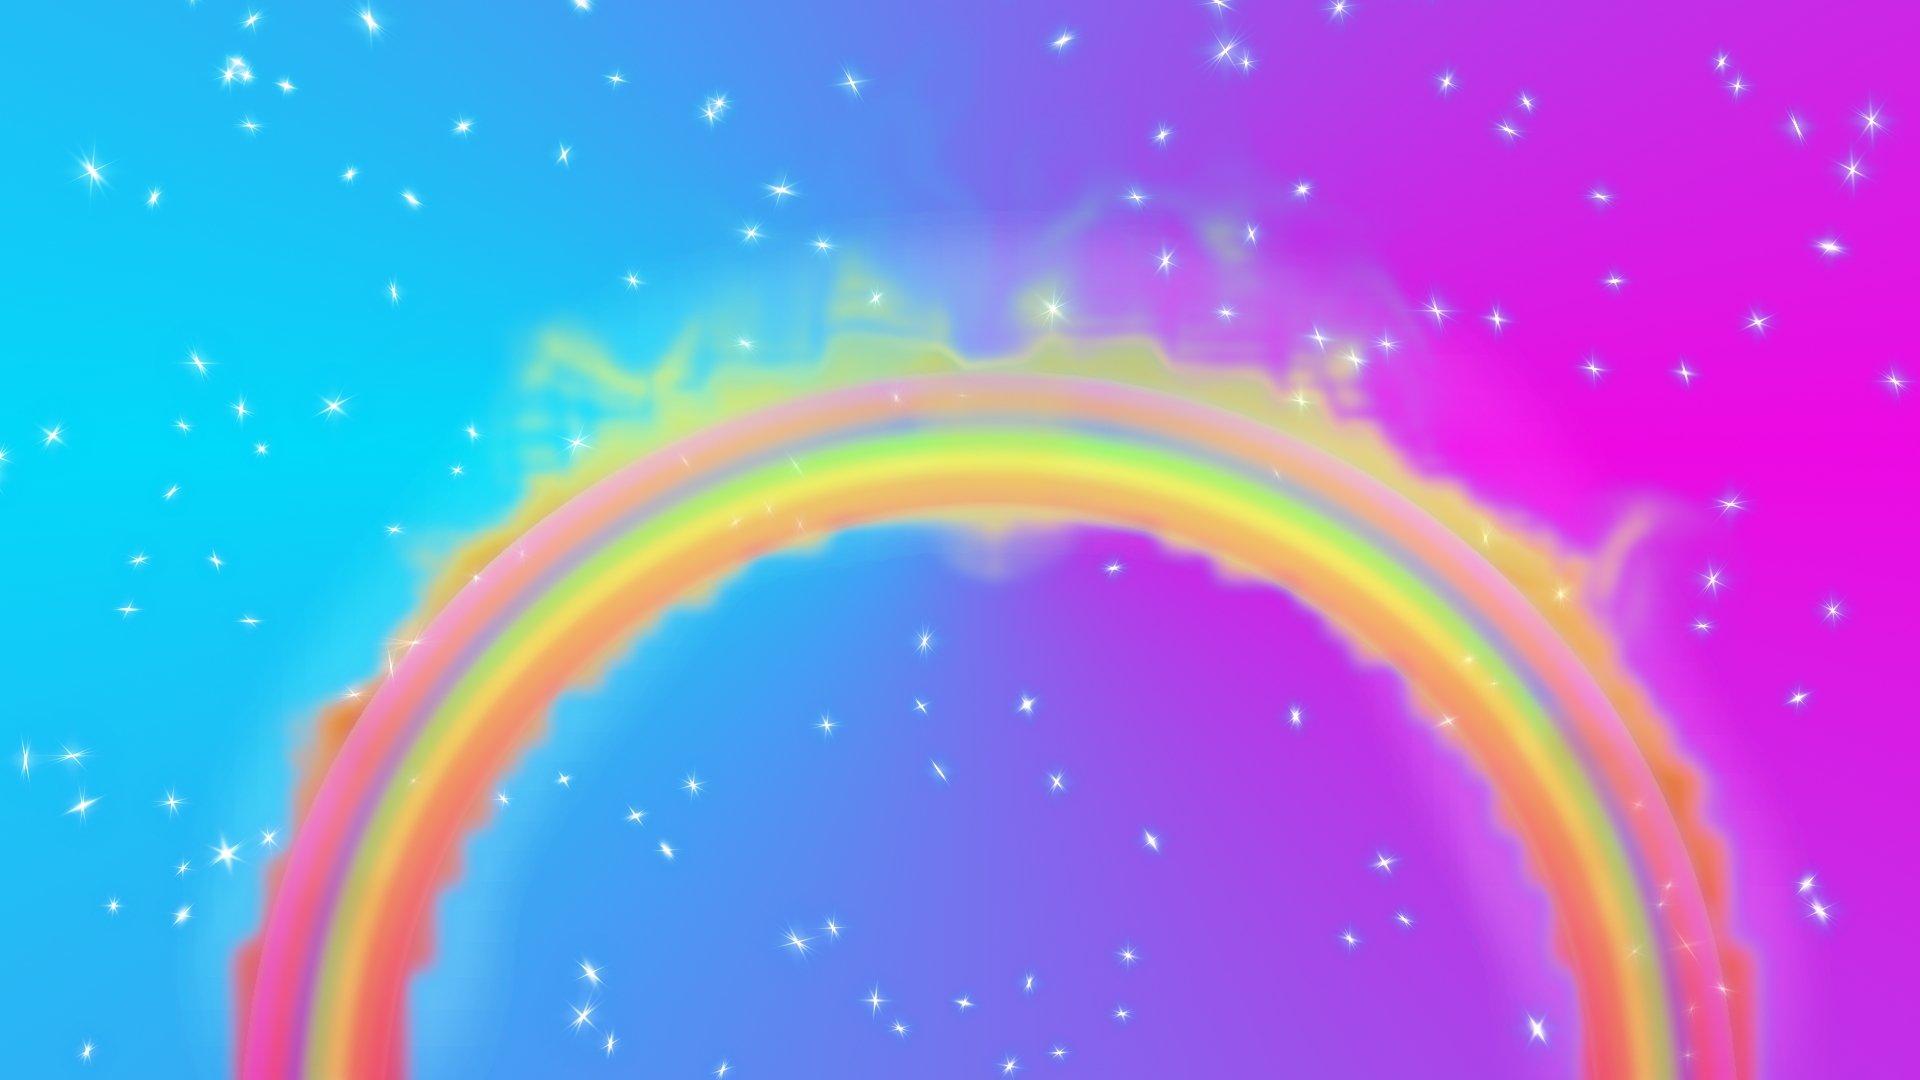 rainbow background wallpaper wallpapersafari